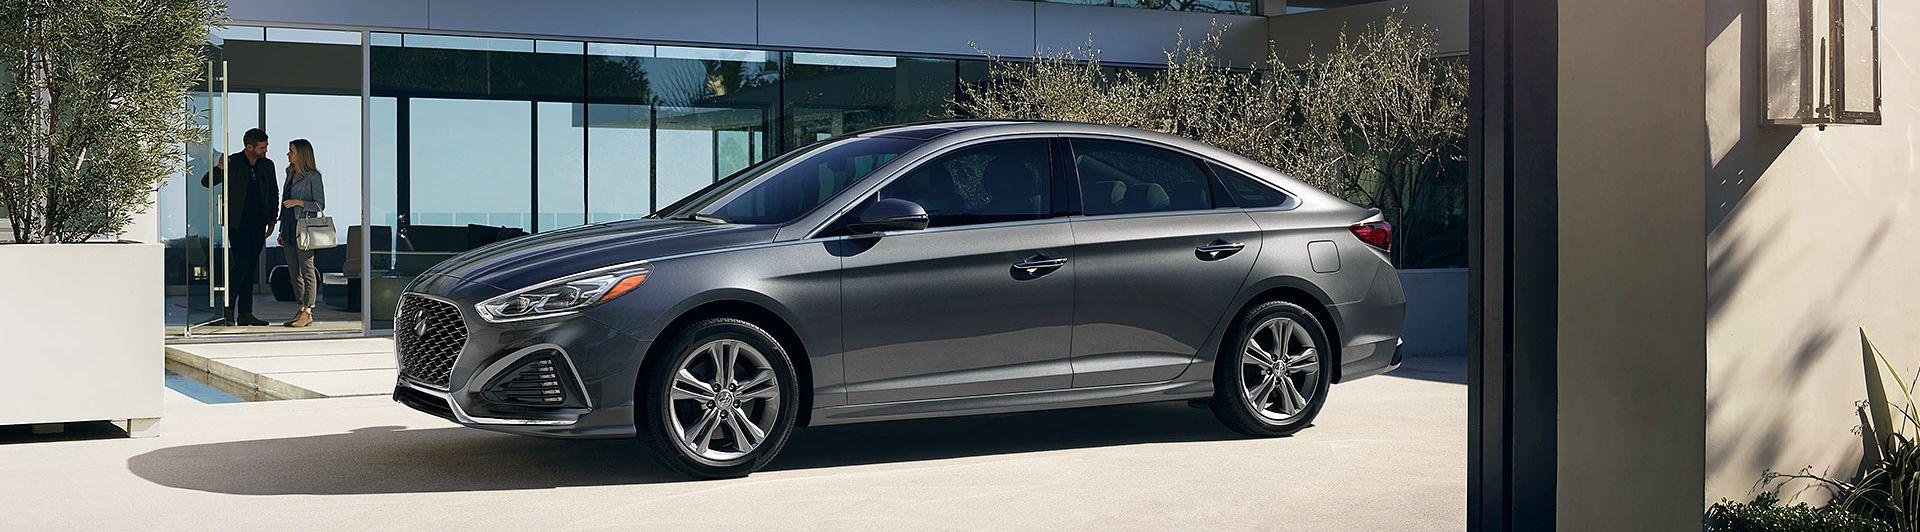 2019 Hyundai Sonata Leasing near Alexandria, VA - Pohanka